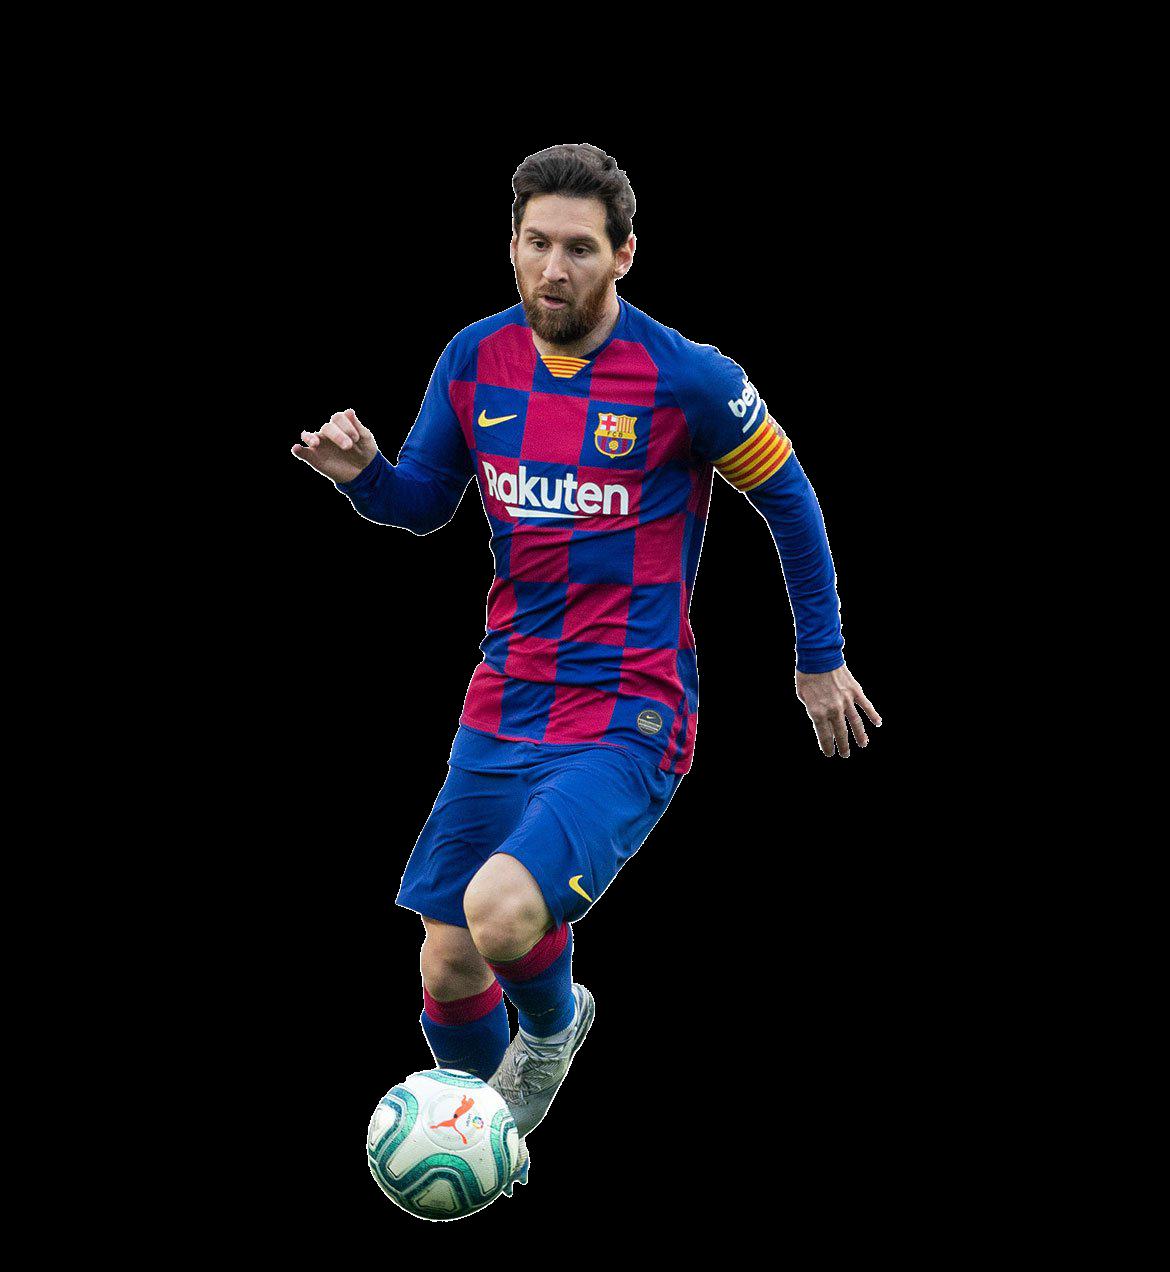 Lionel Messi PNG Transparent Images | PNG All